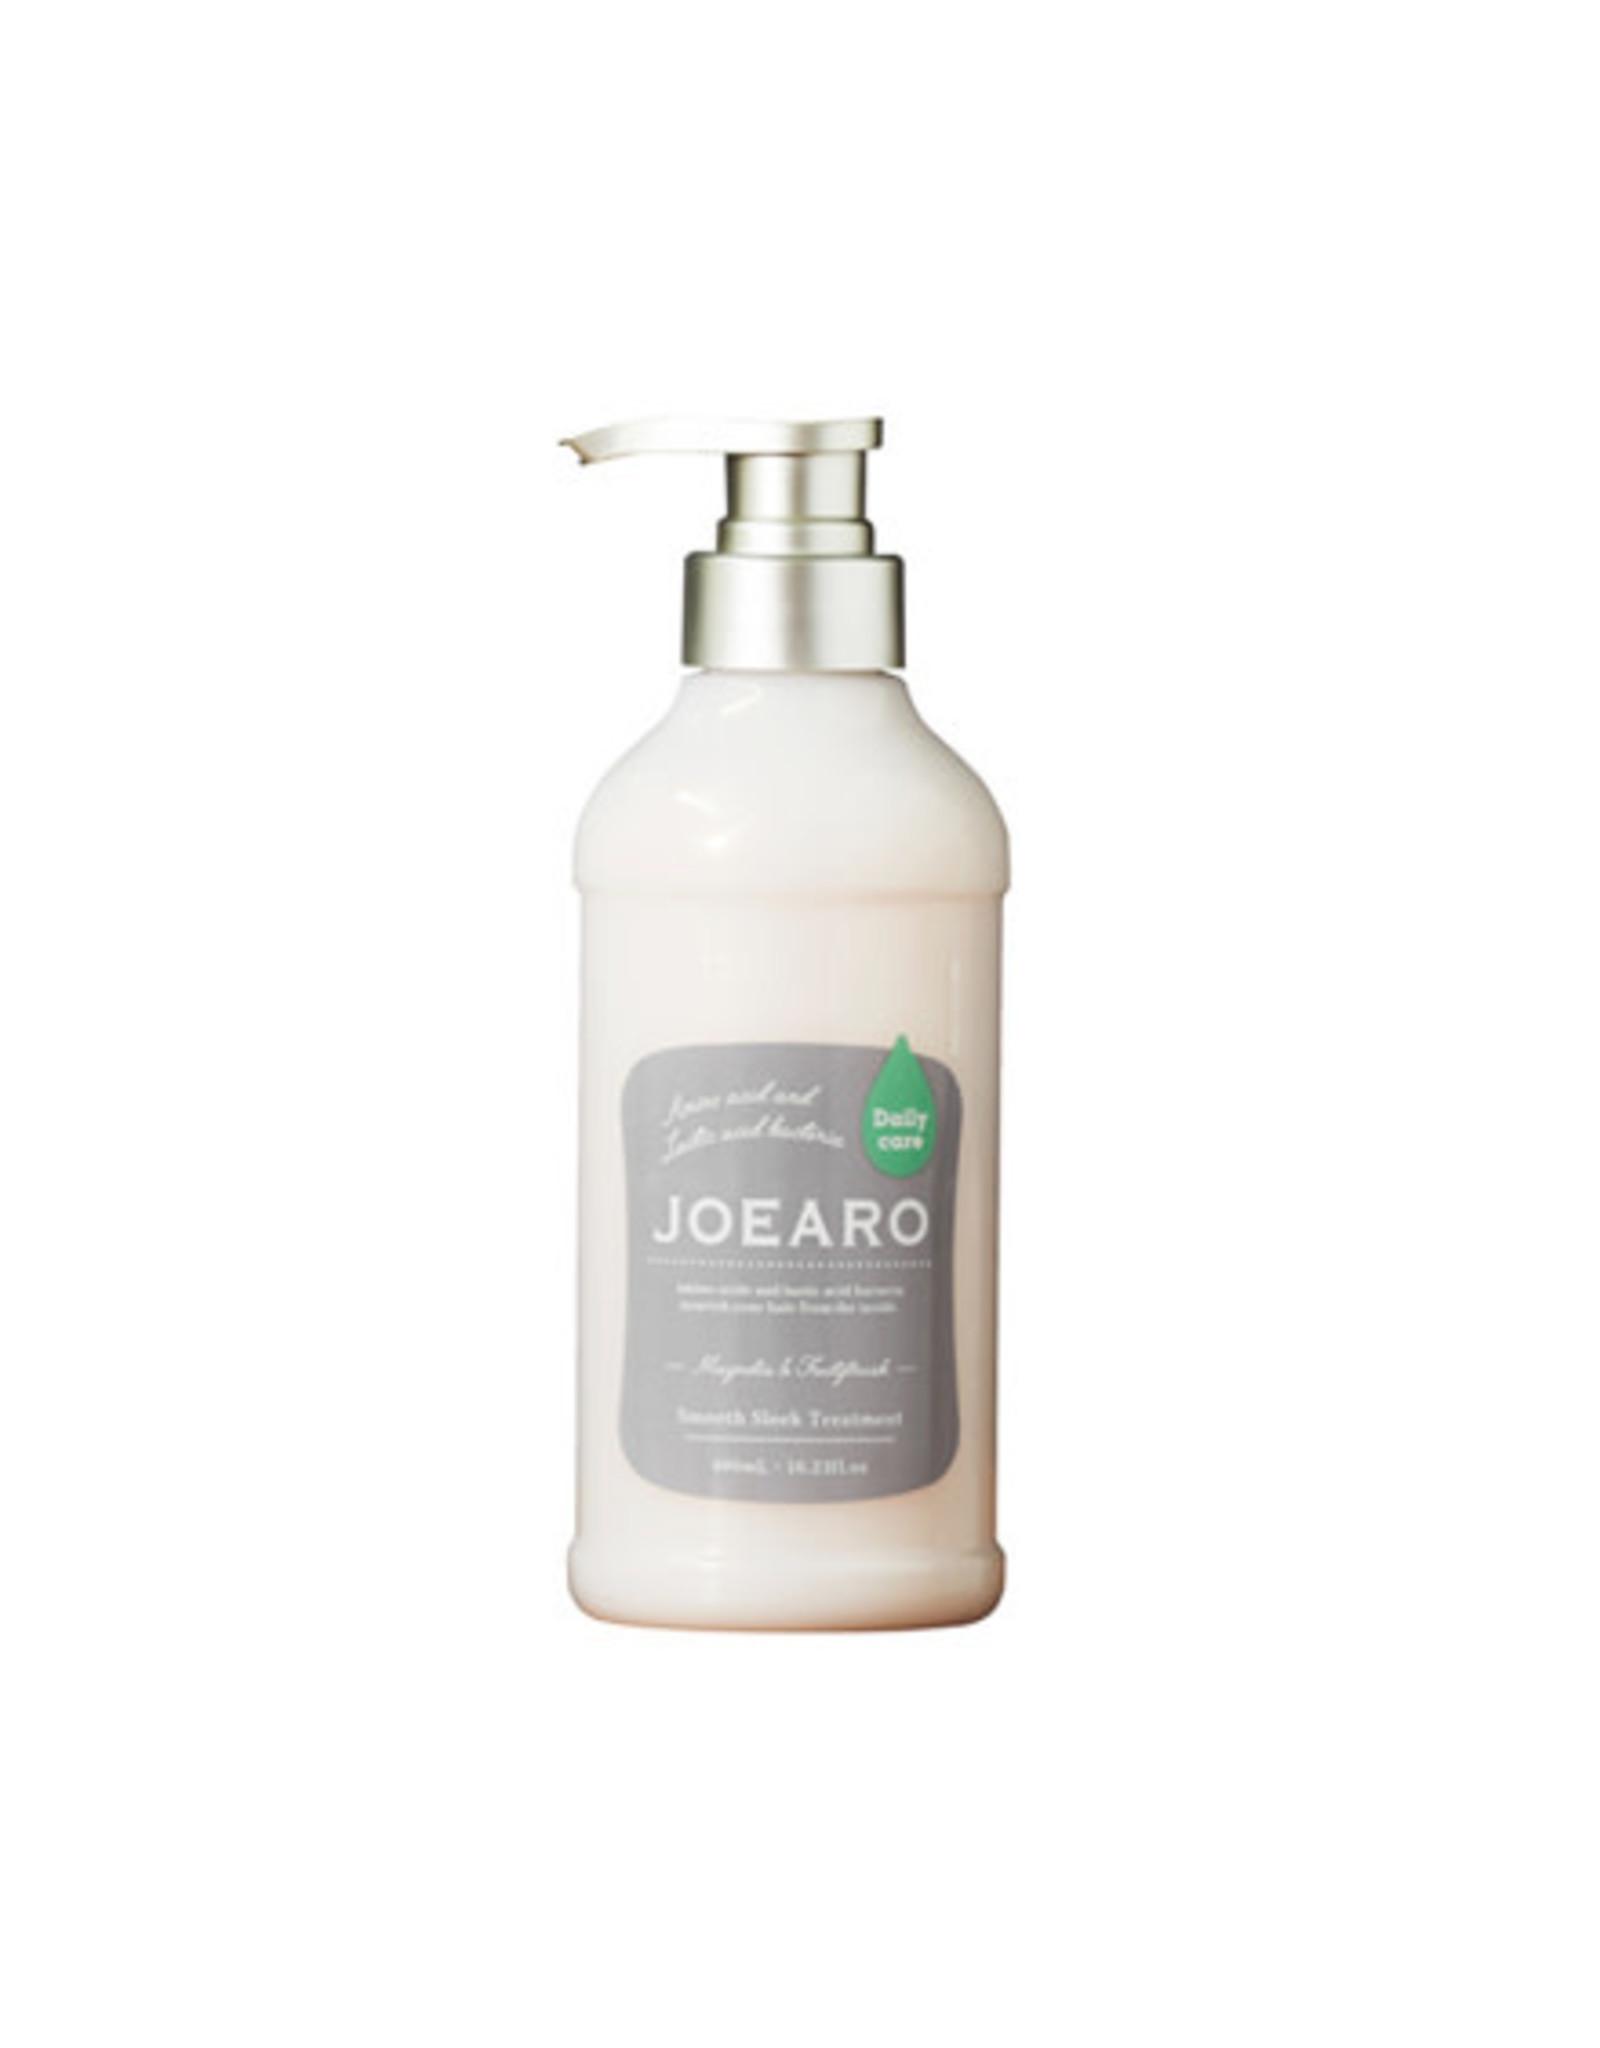 Joearo Smooth Sleek Treatment